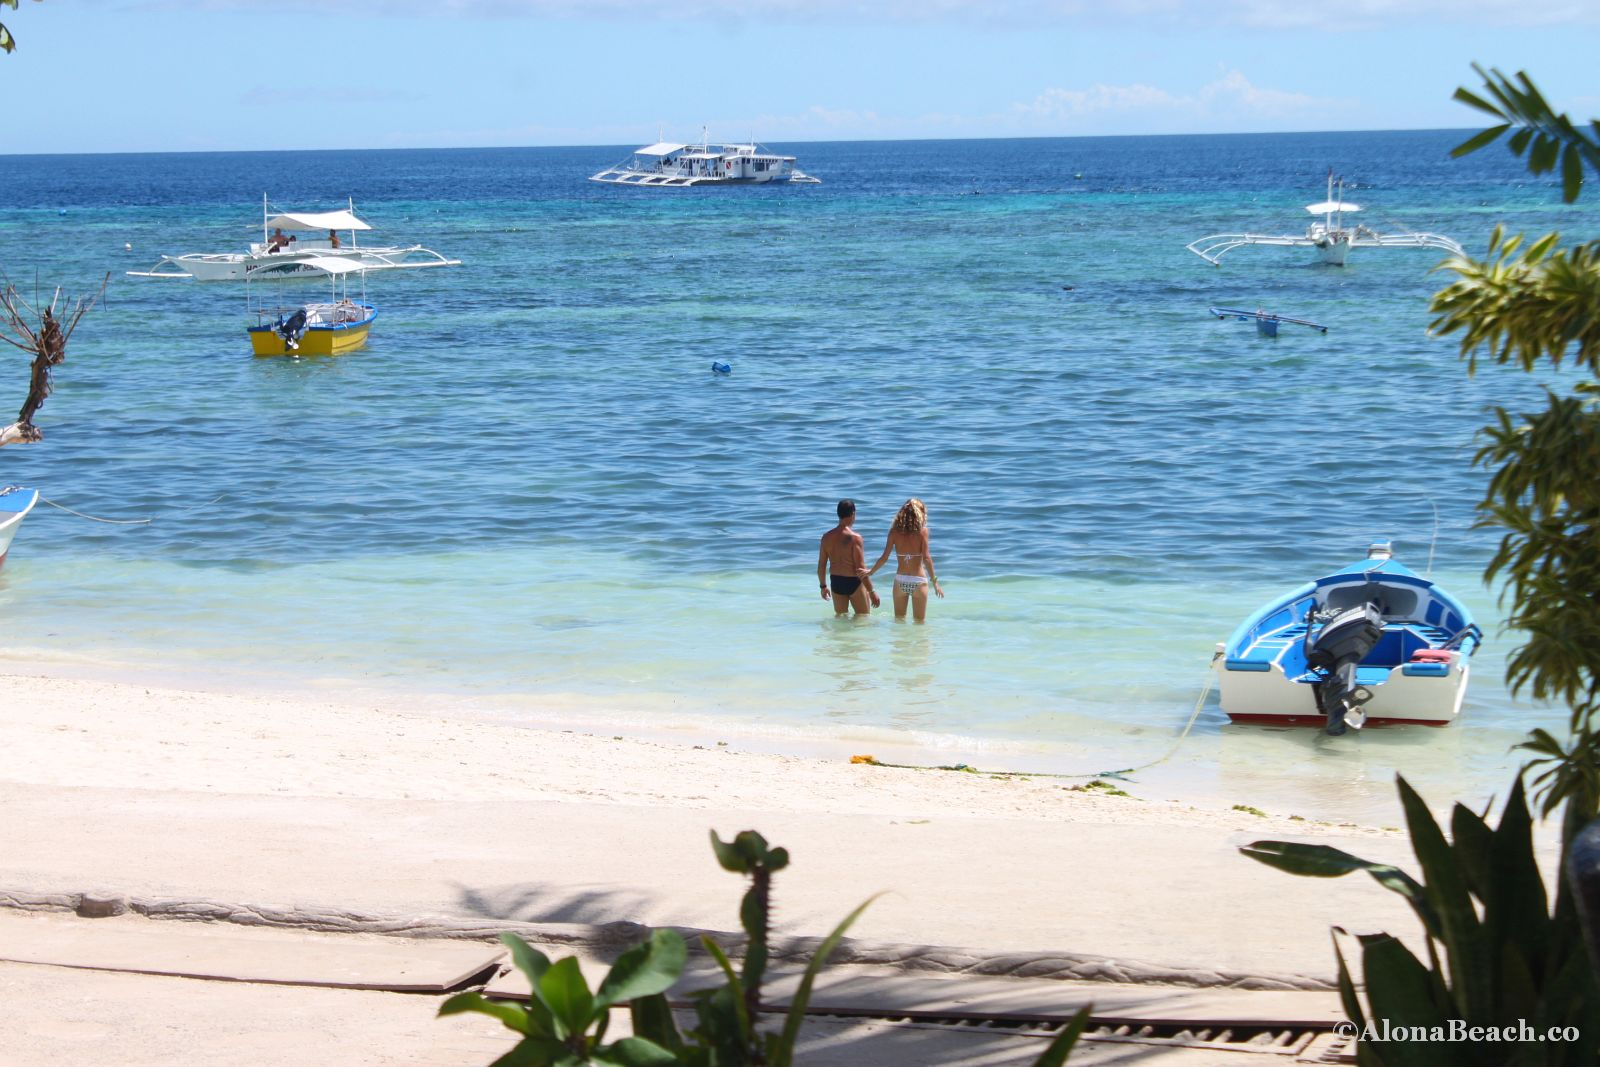 Low travel season here in Bohol